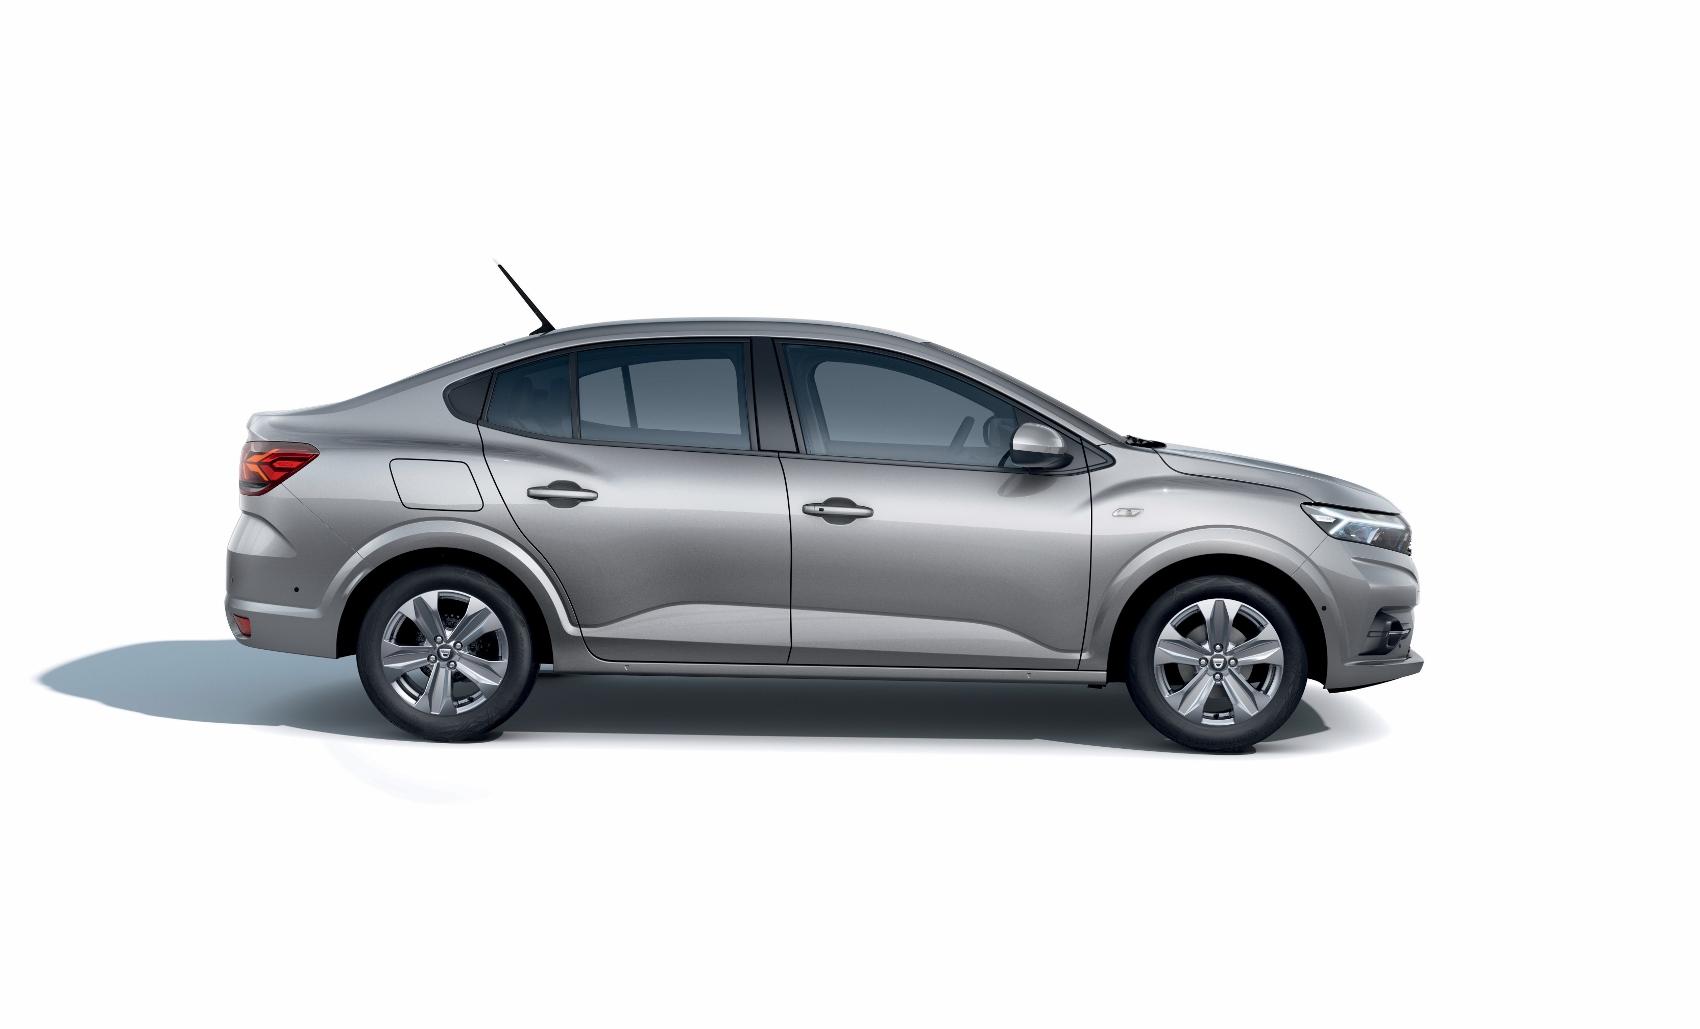 2020 - New Dacia LOGAN (4) (1700x1029)